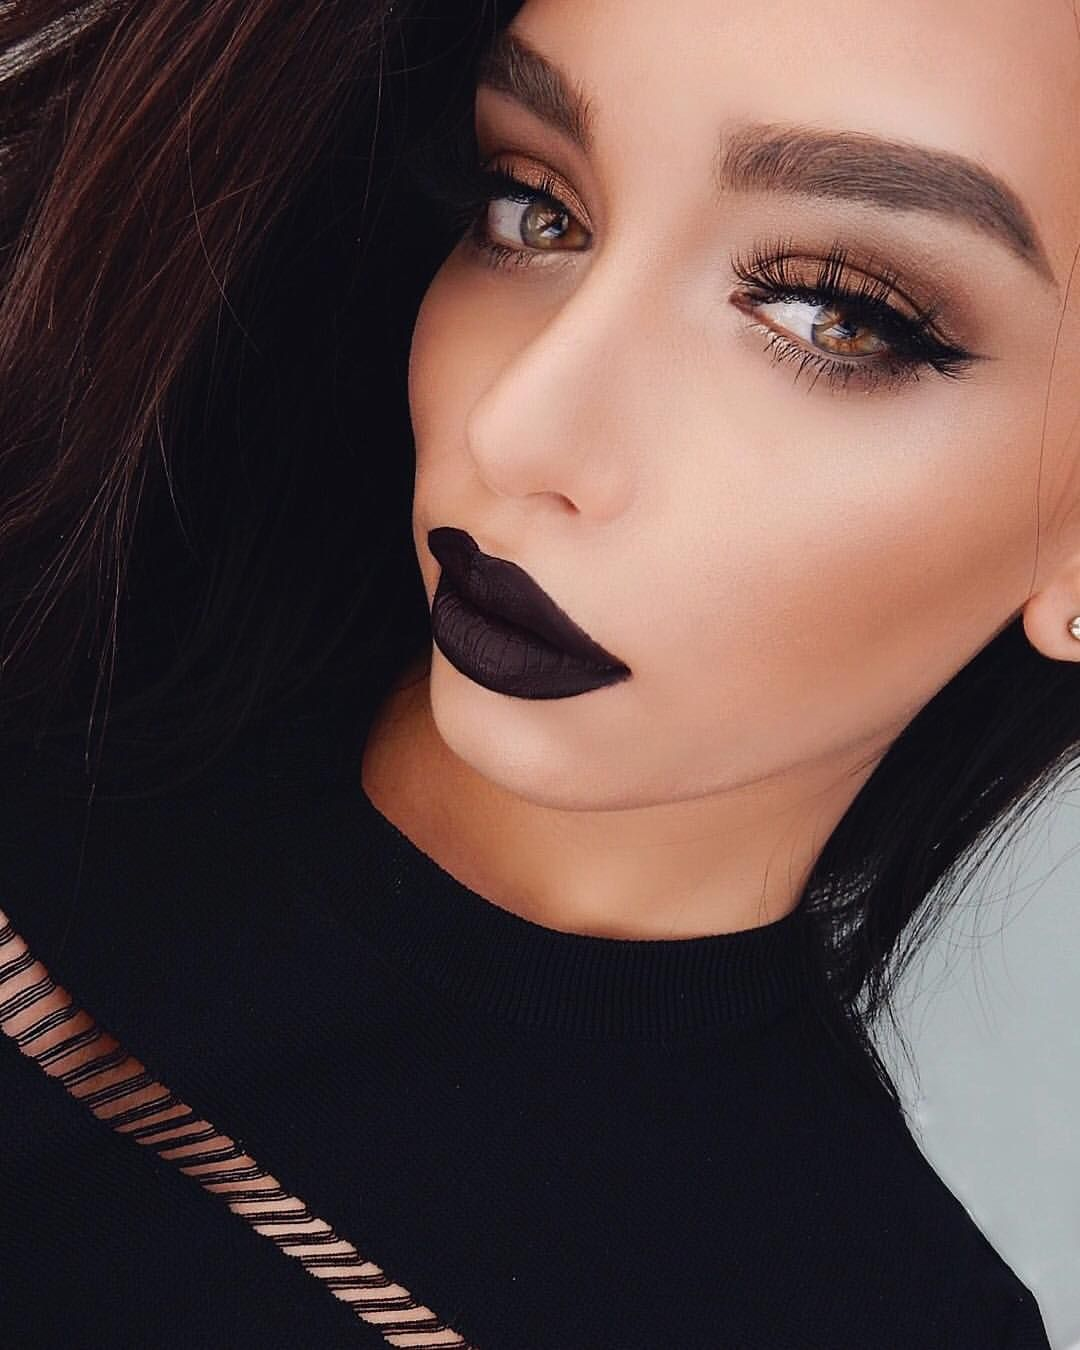 "JANICE JOOSTEMA on Instagram: ""Noir ◼️ Meeeeeowwwww @anastasiabeverlyhills 'Midnight' Liquid Lipstick #anastasiabeverlyhills"""